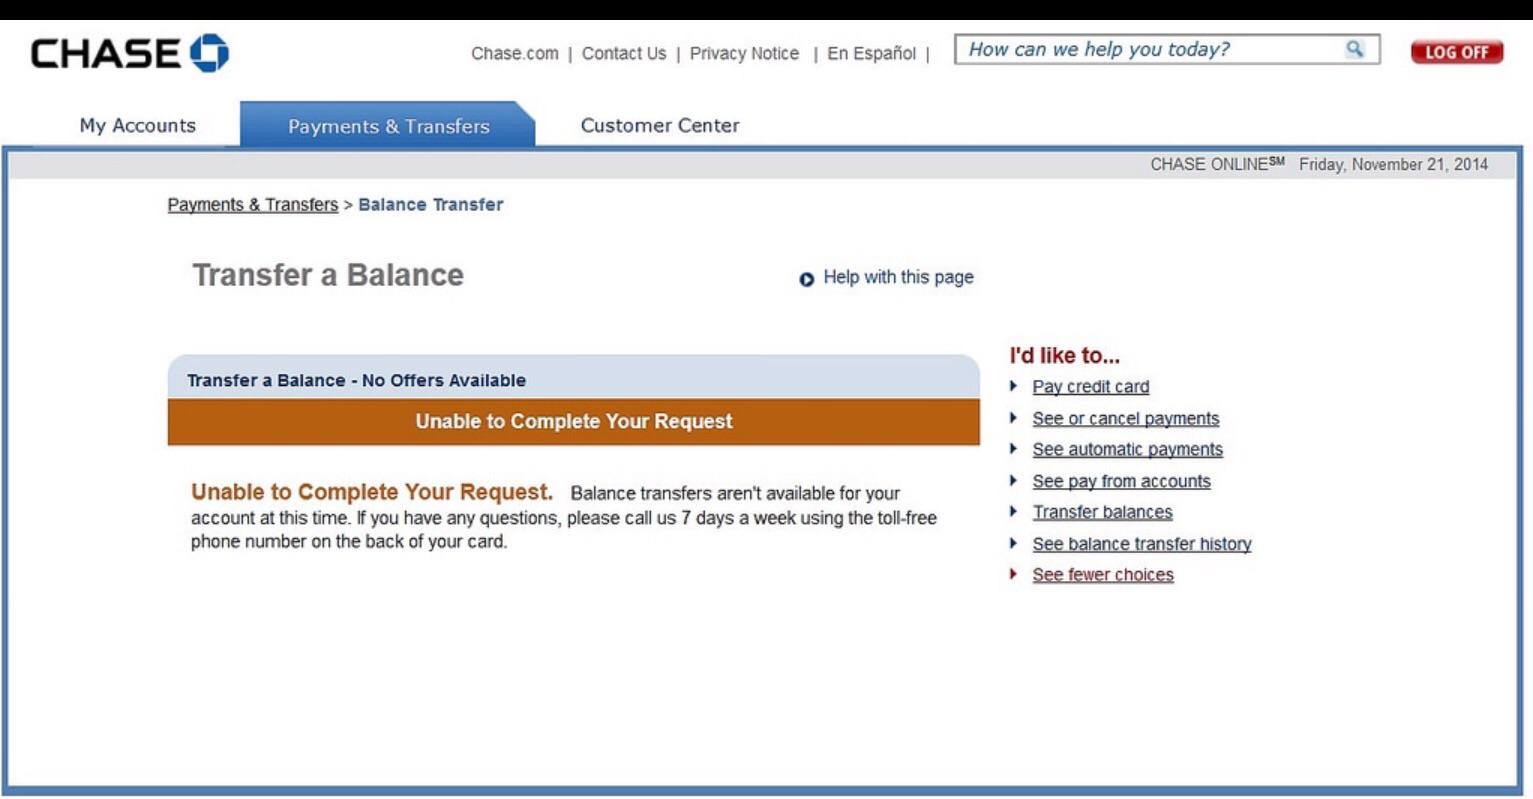 Chase Slate/Amazon non-promo balance transfer DENI... - Page 2 ...